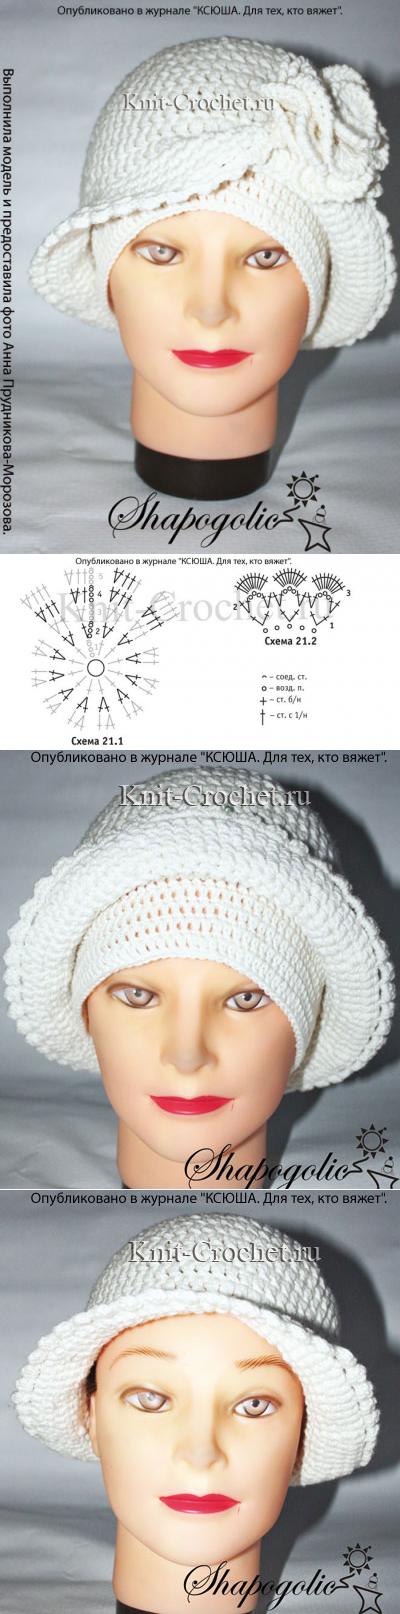 ВЯЗАНИЕ крючком | crochet | Pinterest | Croché, Ganchillo y Gorro tejido